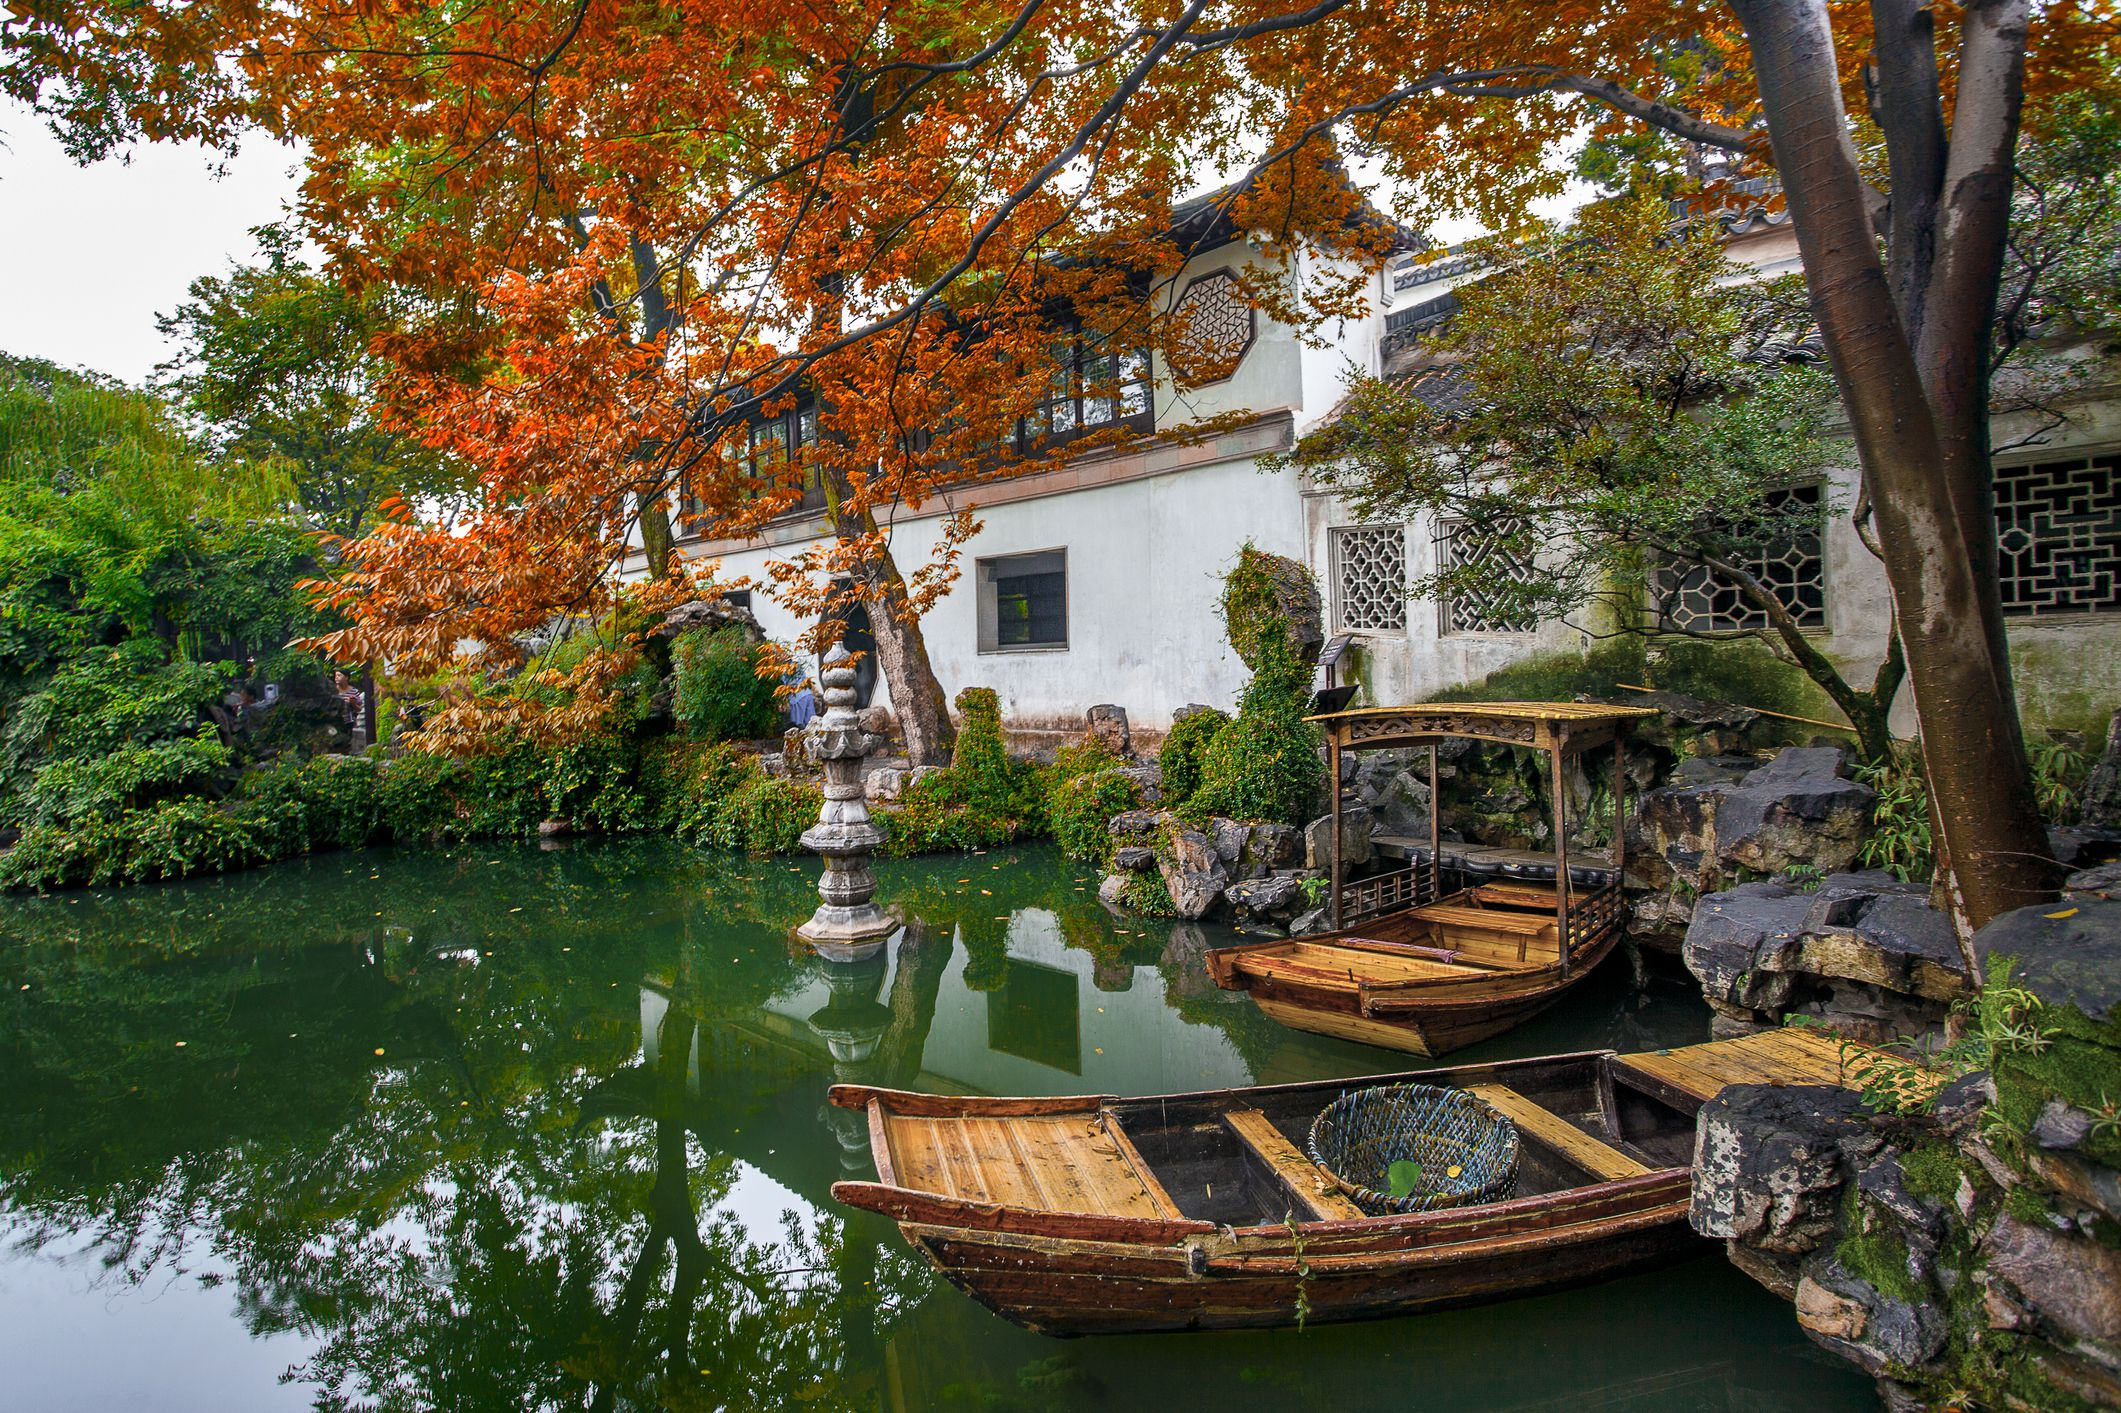 Jardín persistente, Suzhou, Jiangsu, China